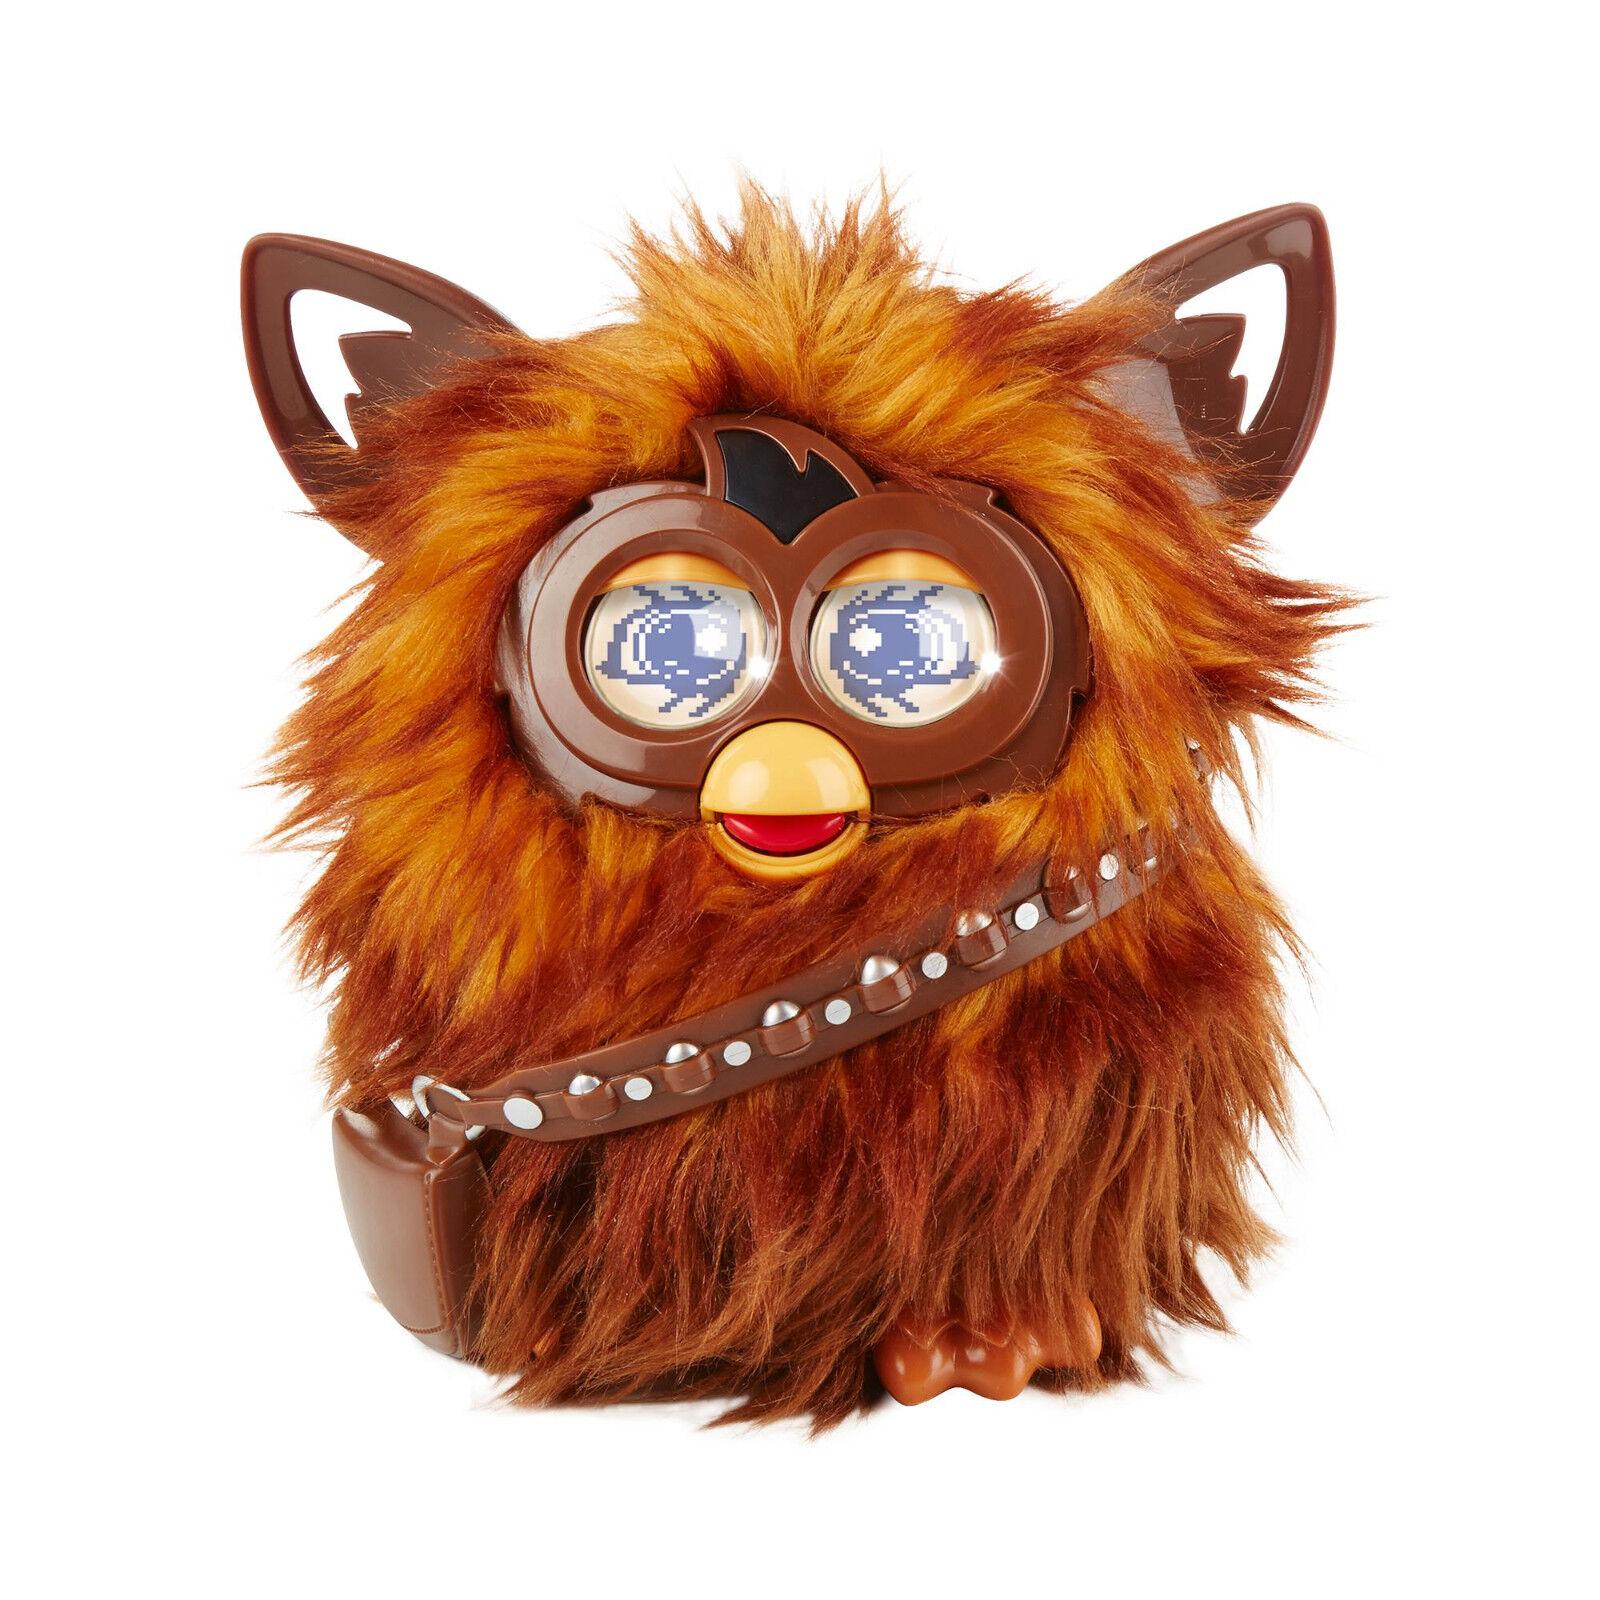 stjärnornas krig Hasbro Furby Furbacca, en Chewbacca -furby, 2015 NY och SEALD i låda